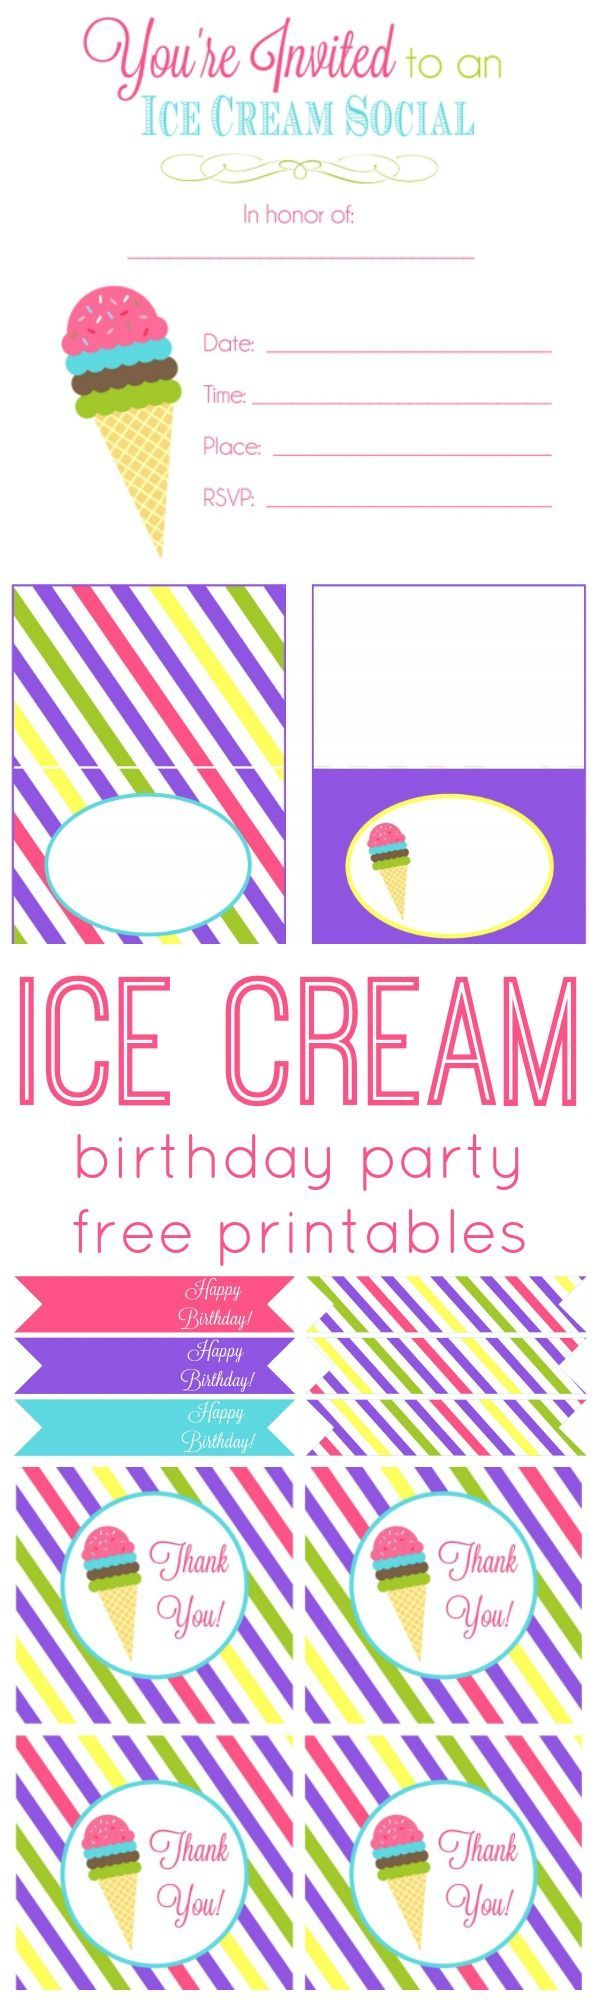 ice cream birthday party free printables   party ideas